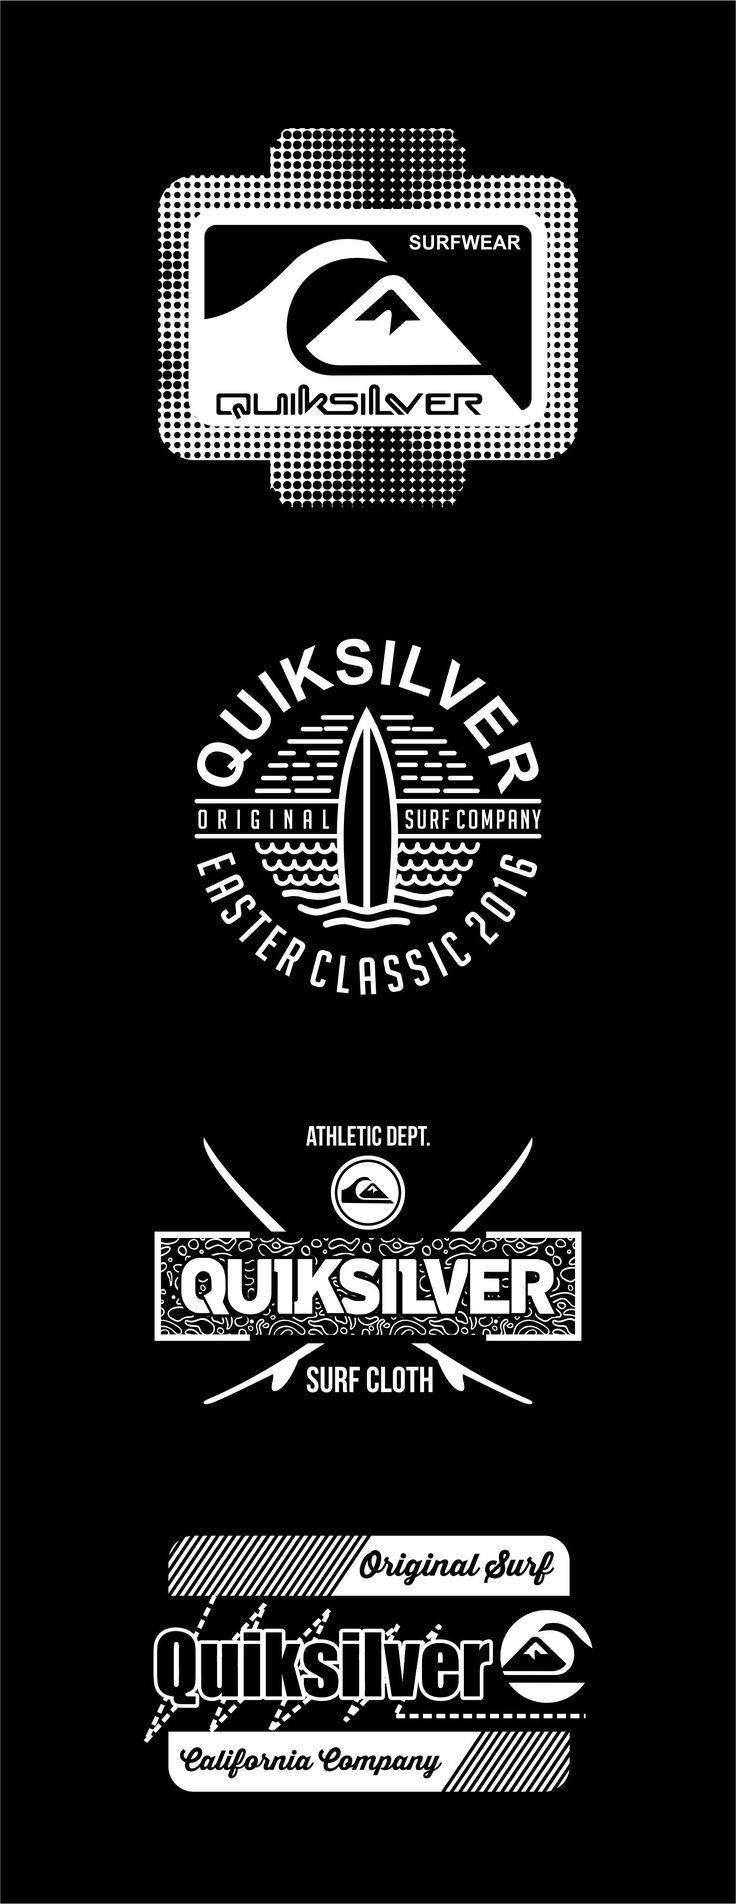 Vintage Vector quiksilver #vintage #vector #vectorsurf #vintagevector #volcom #adidas #billabong #rusty #nike #puma #levis #quiksilver #ripcurl #dc #vans #spyderbilt #reebok